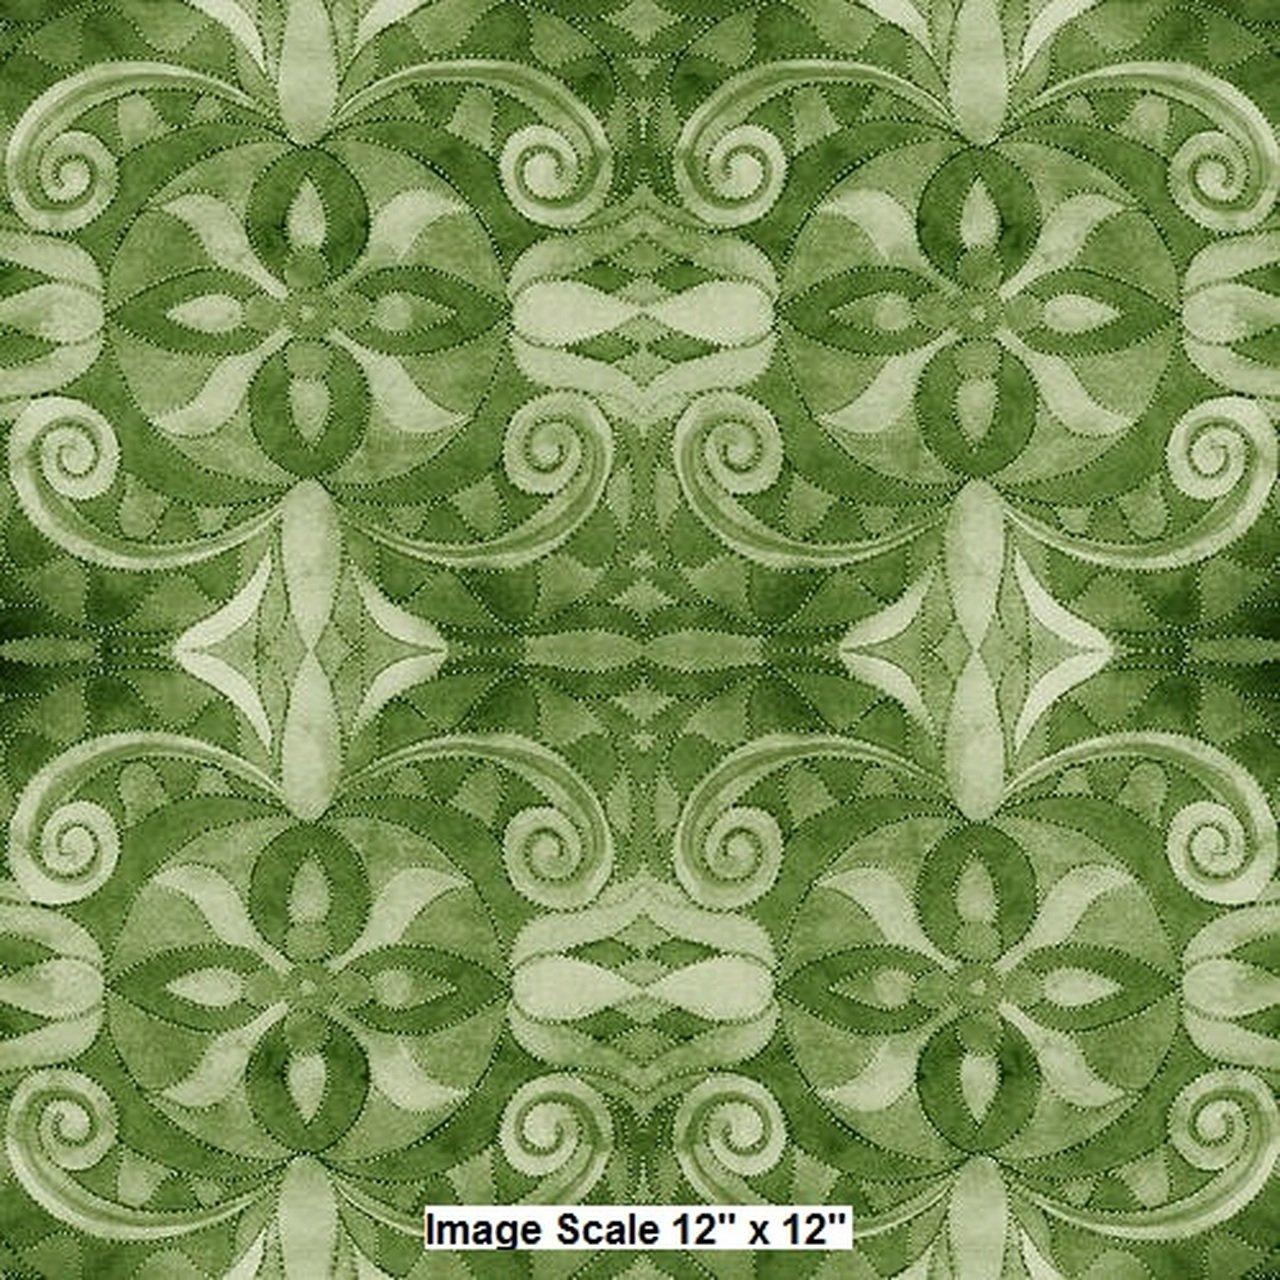 108 Baroque Wideback Digital Print - Green